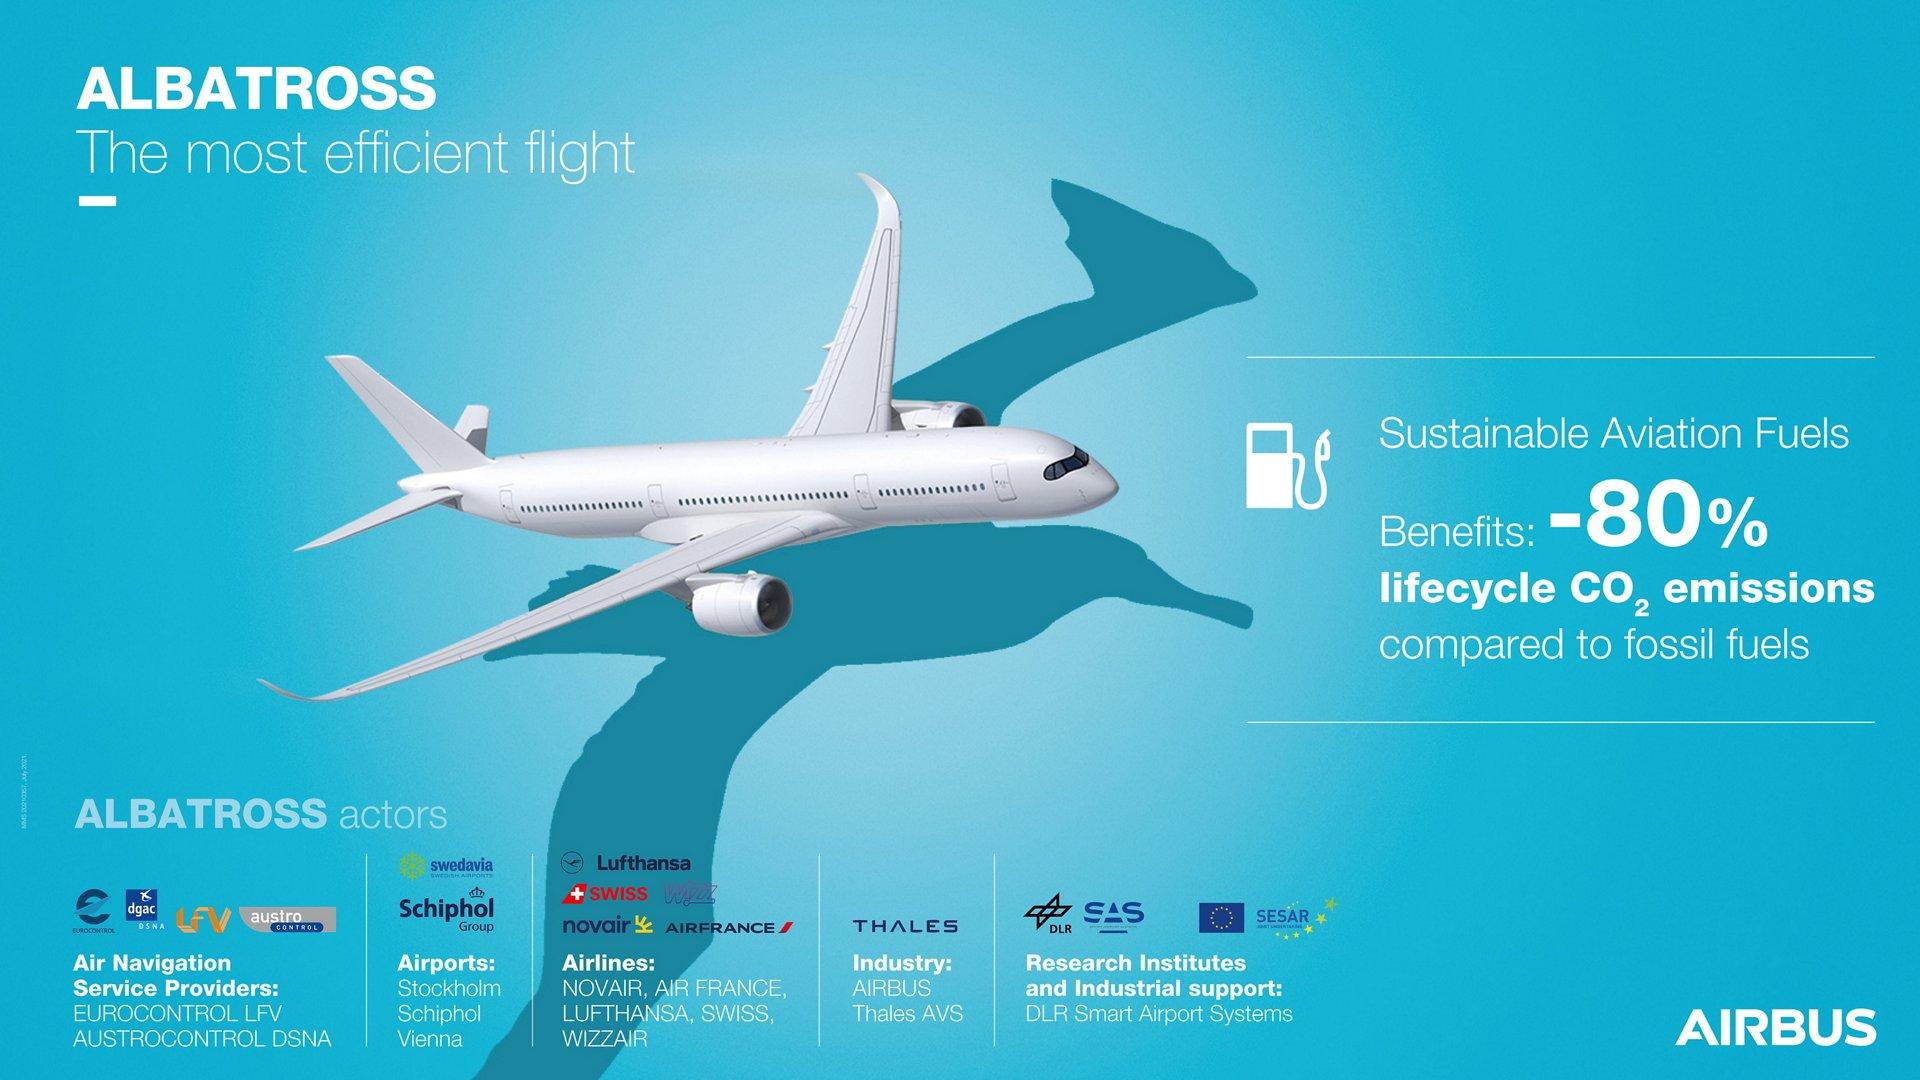 Seeking the most efficient flight - Episode 3 :  Sustainable Aviation Fuels (SAF)